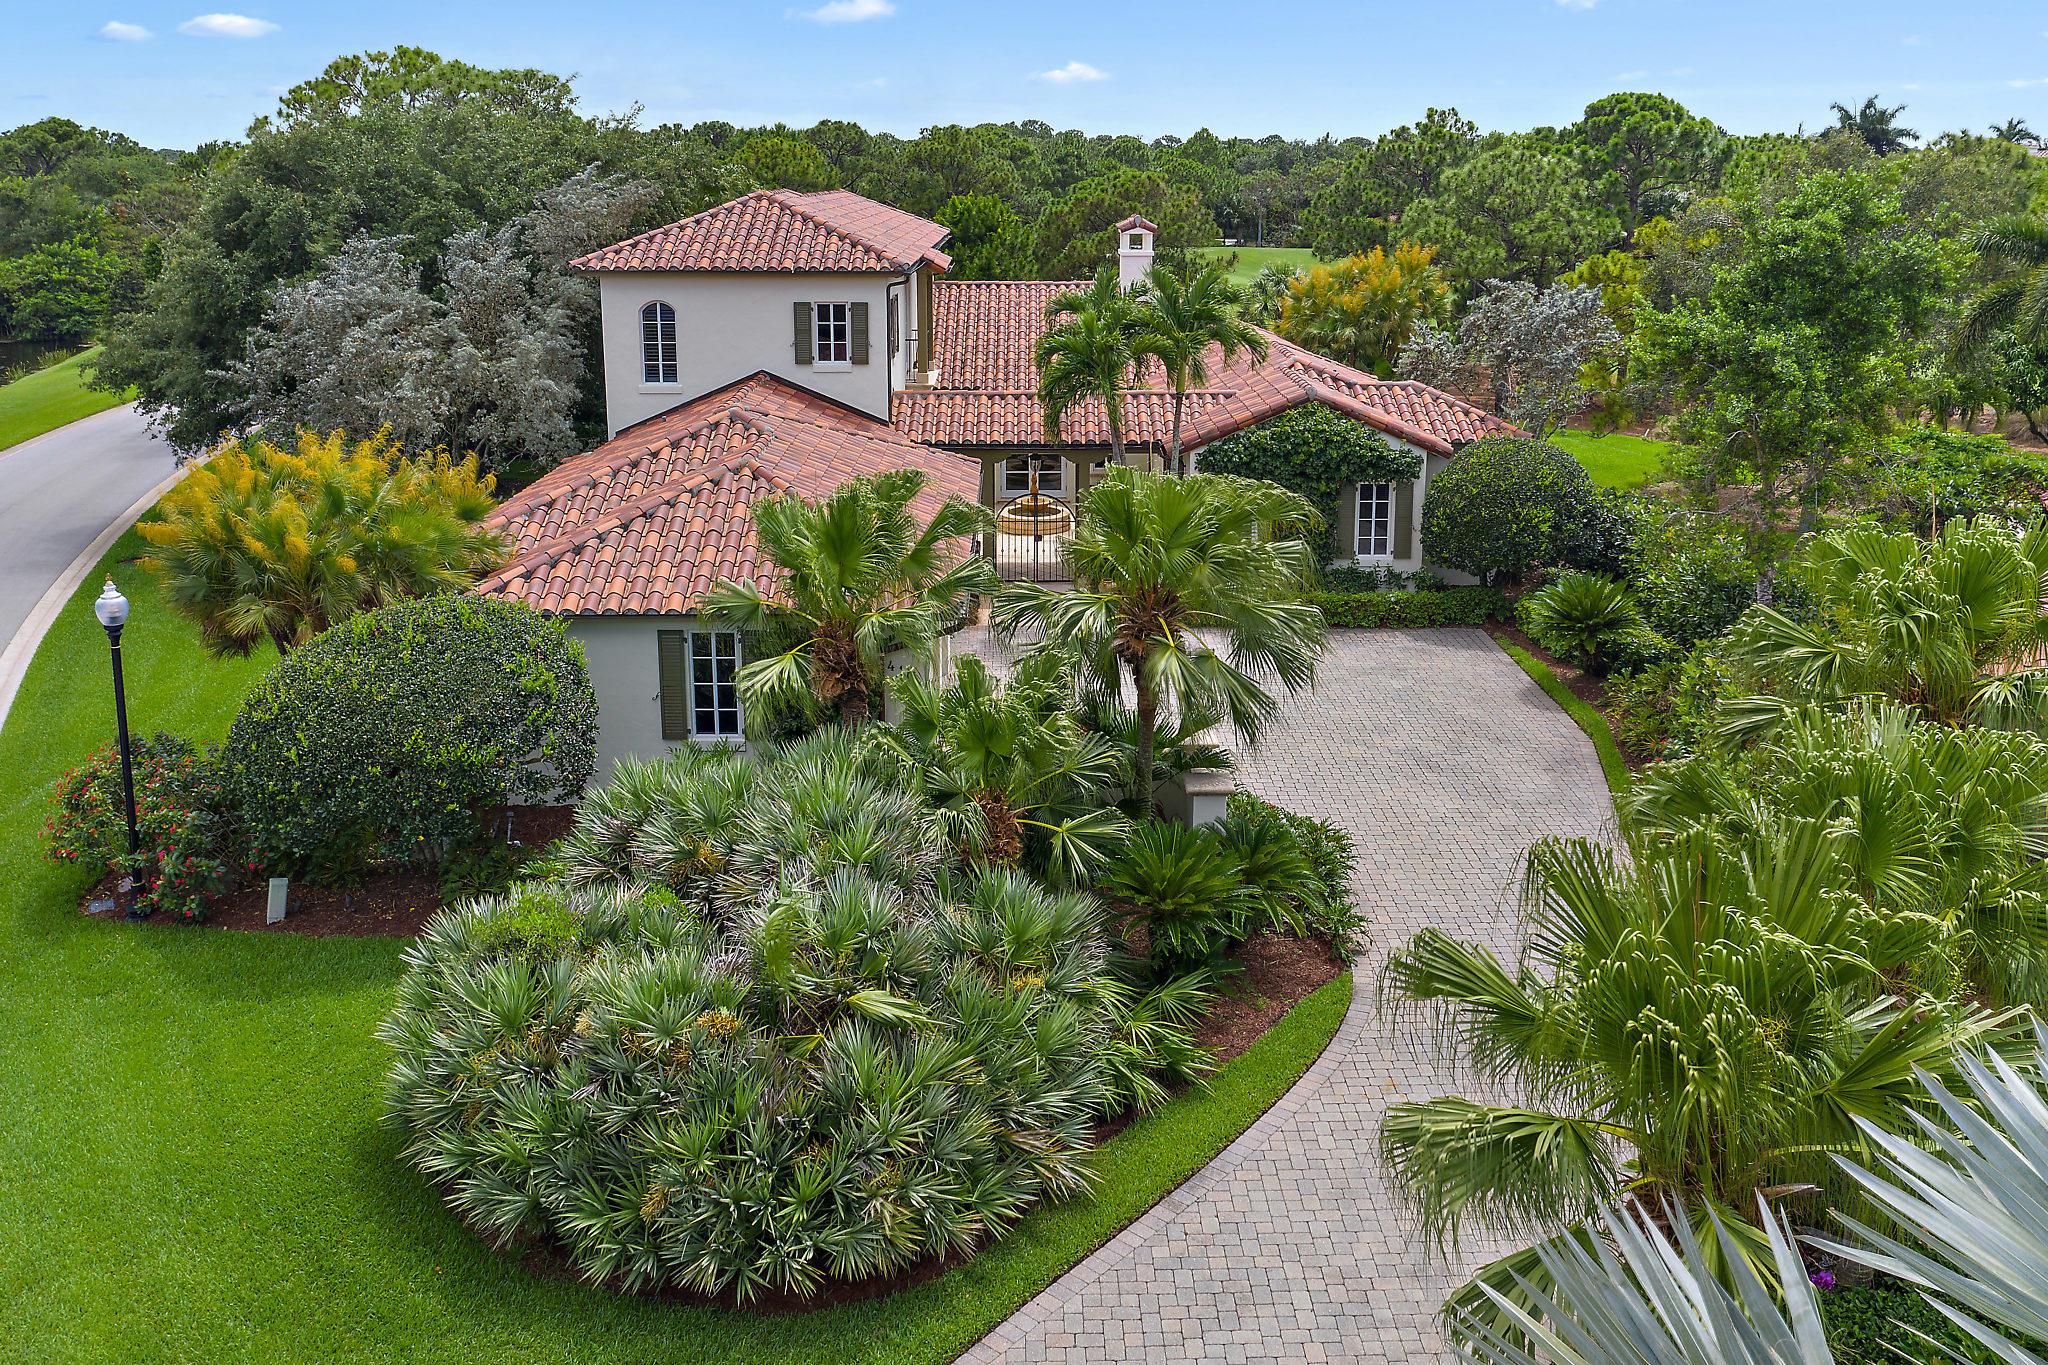 410 Red Hawk Drive, Jupiter, Florida 33477, 4 Bedrooms Bedrooms, ,4.1 BathroomsBathrooms,A,Single family,Red Hawk,RX-10570397